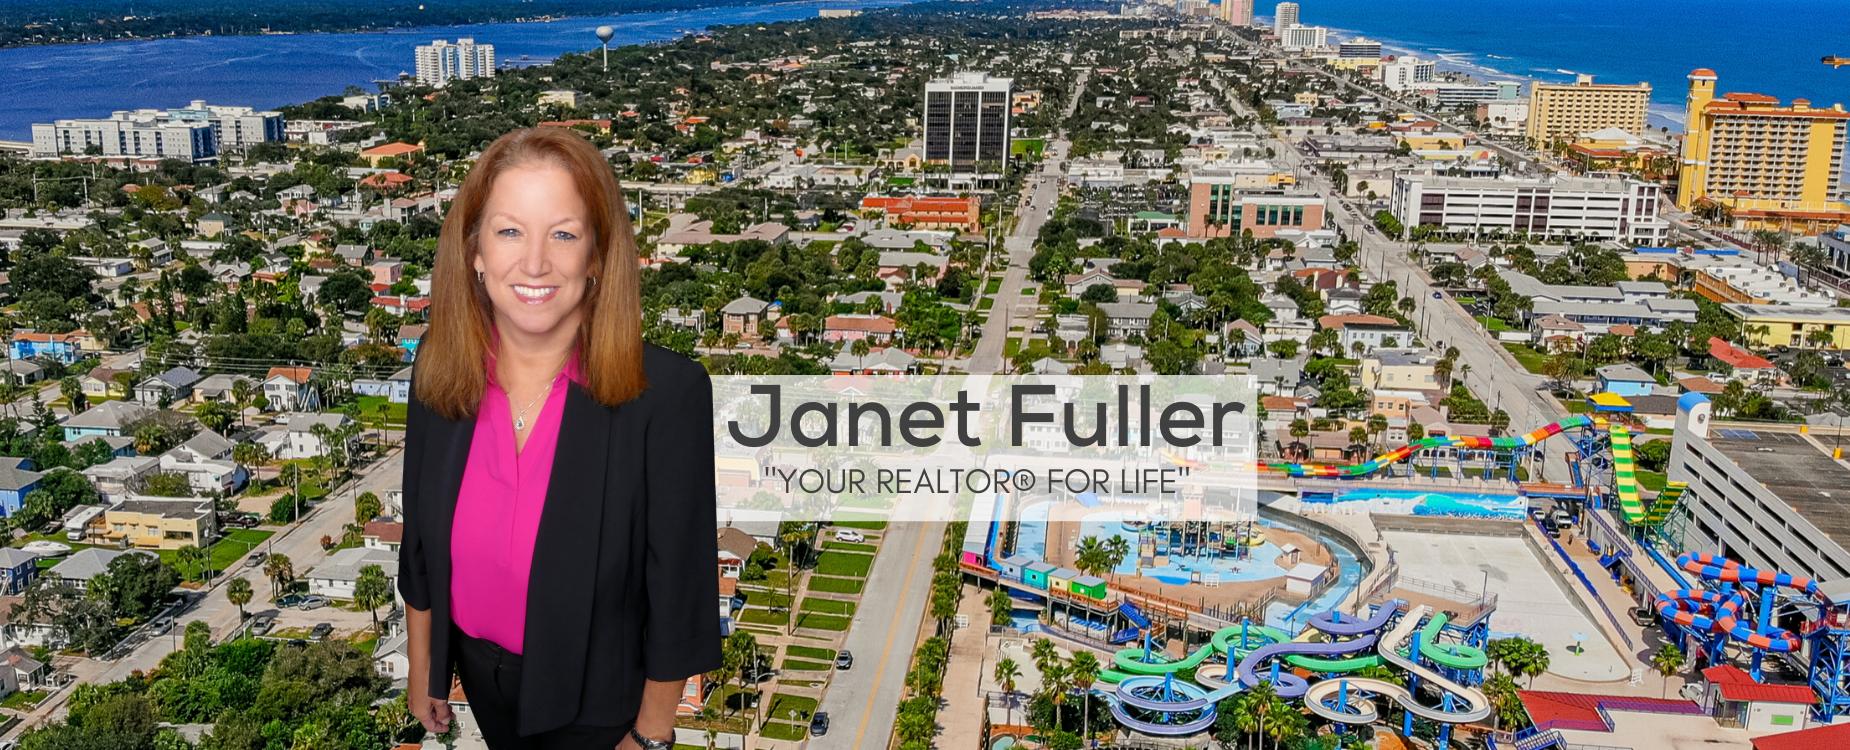 Daytona Beach Janet